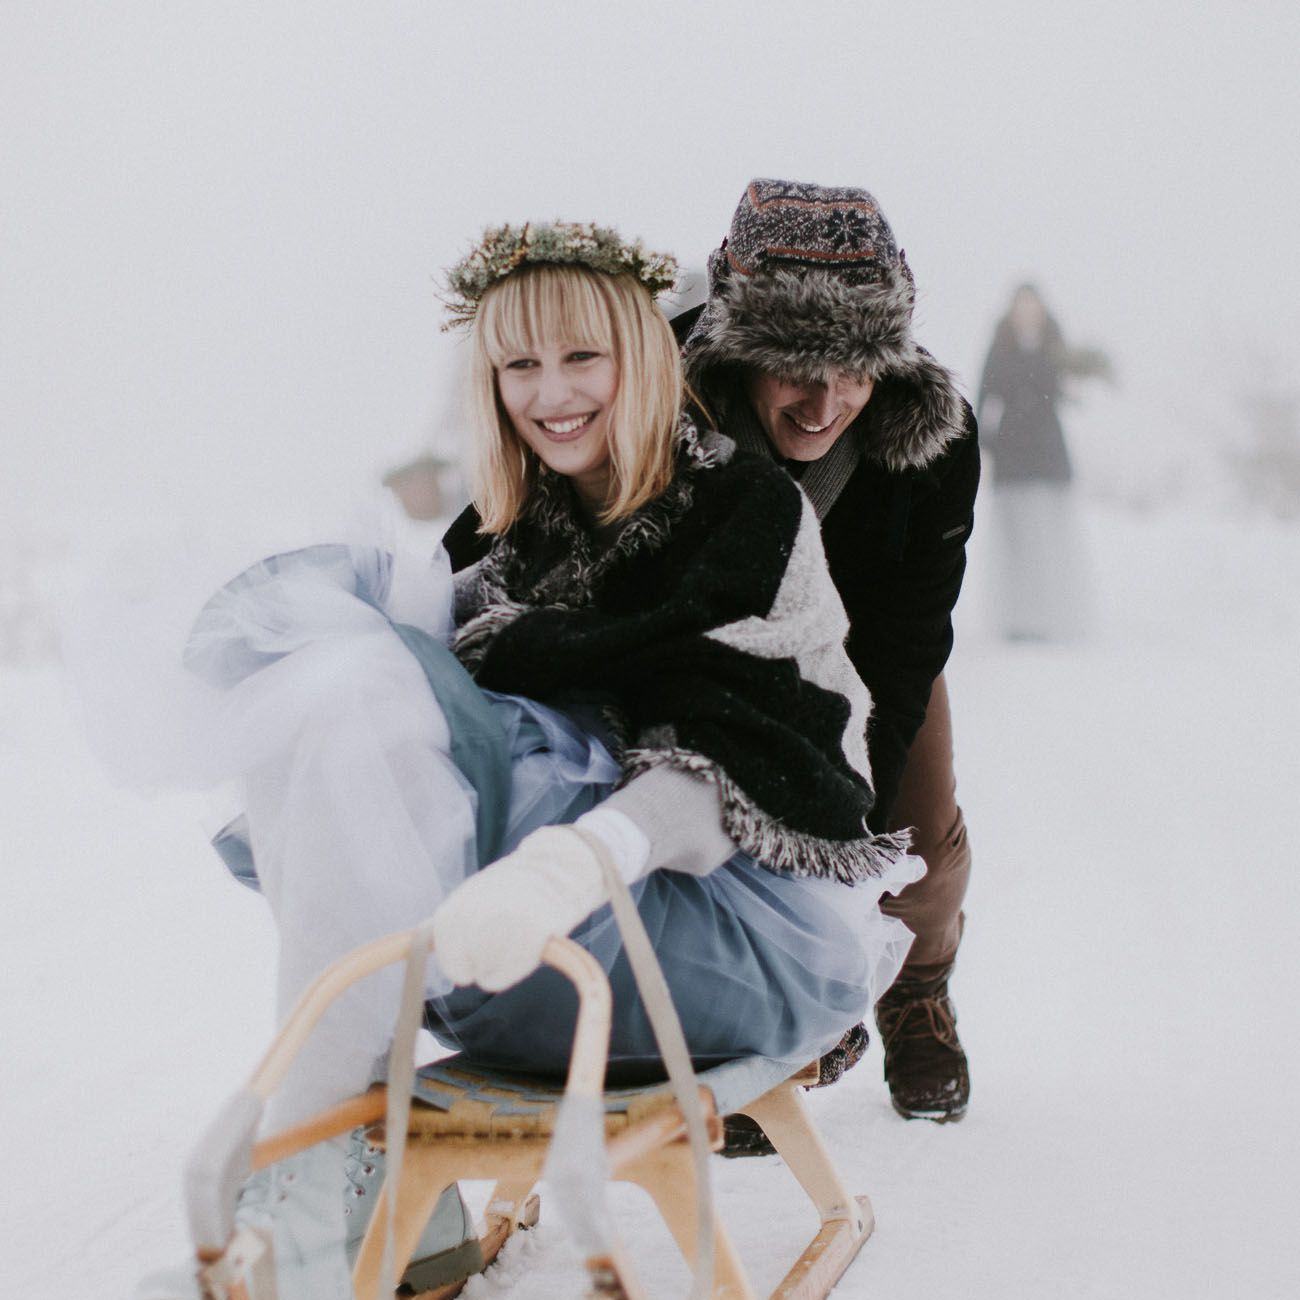 Bride and groom sledding